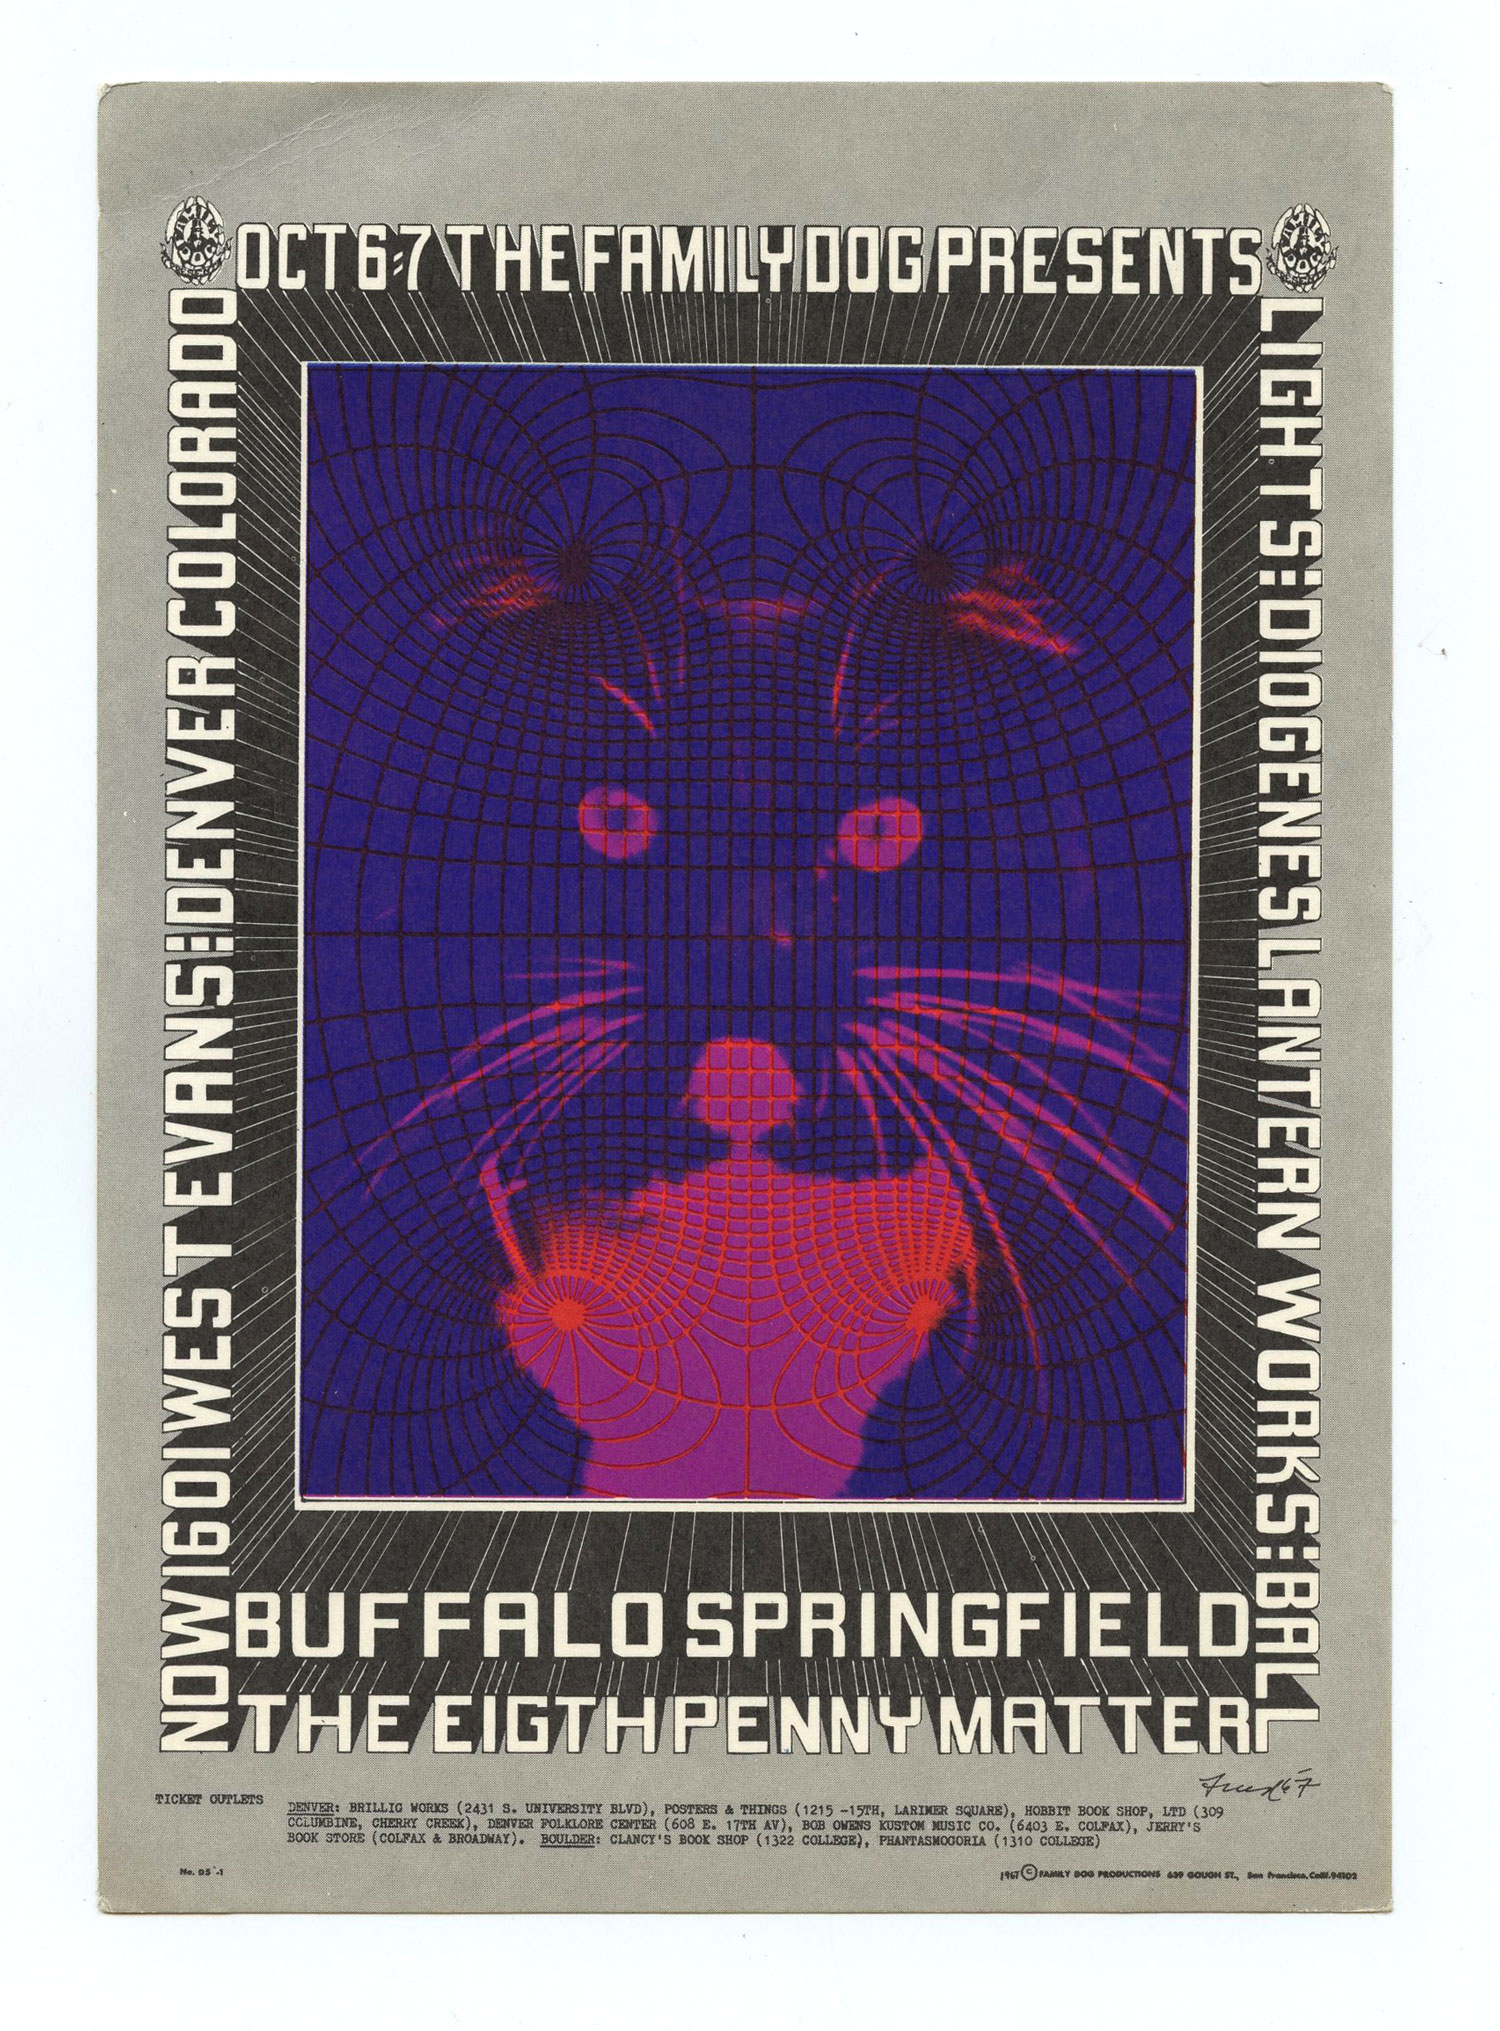 FDD  5 Postcard Buffalo Springfield 1967 Oct 6